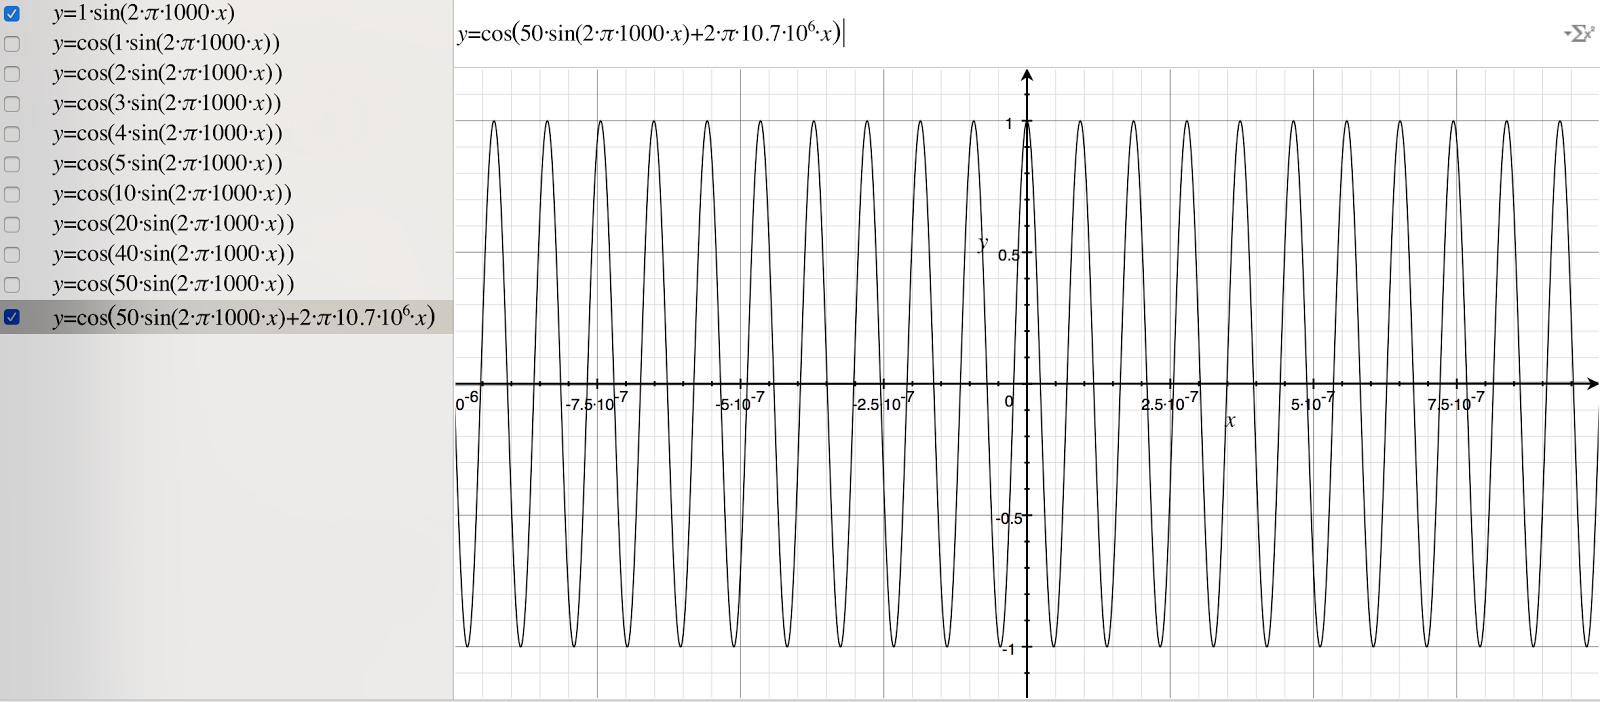 Radio Electronics 12 2015 La1800 Portable Am Fm Circuit Design Electronic Project Vfmcos2fct Msin2ft M10 Fc107mhz F1khz